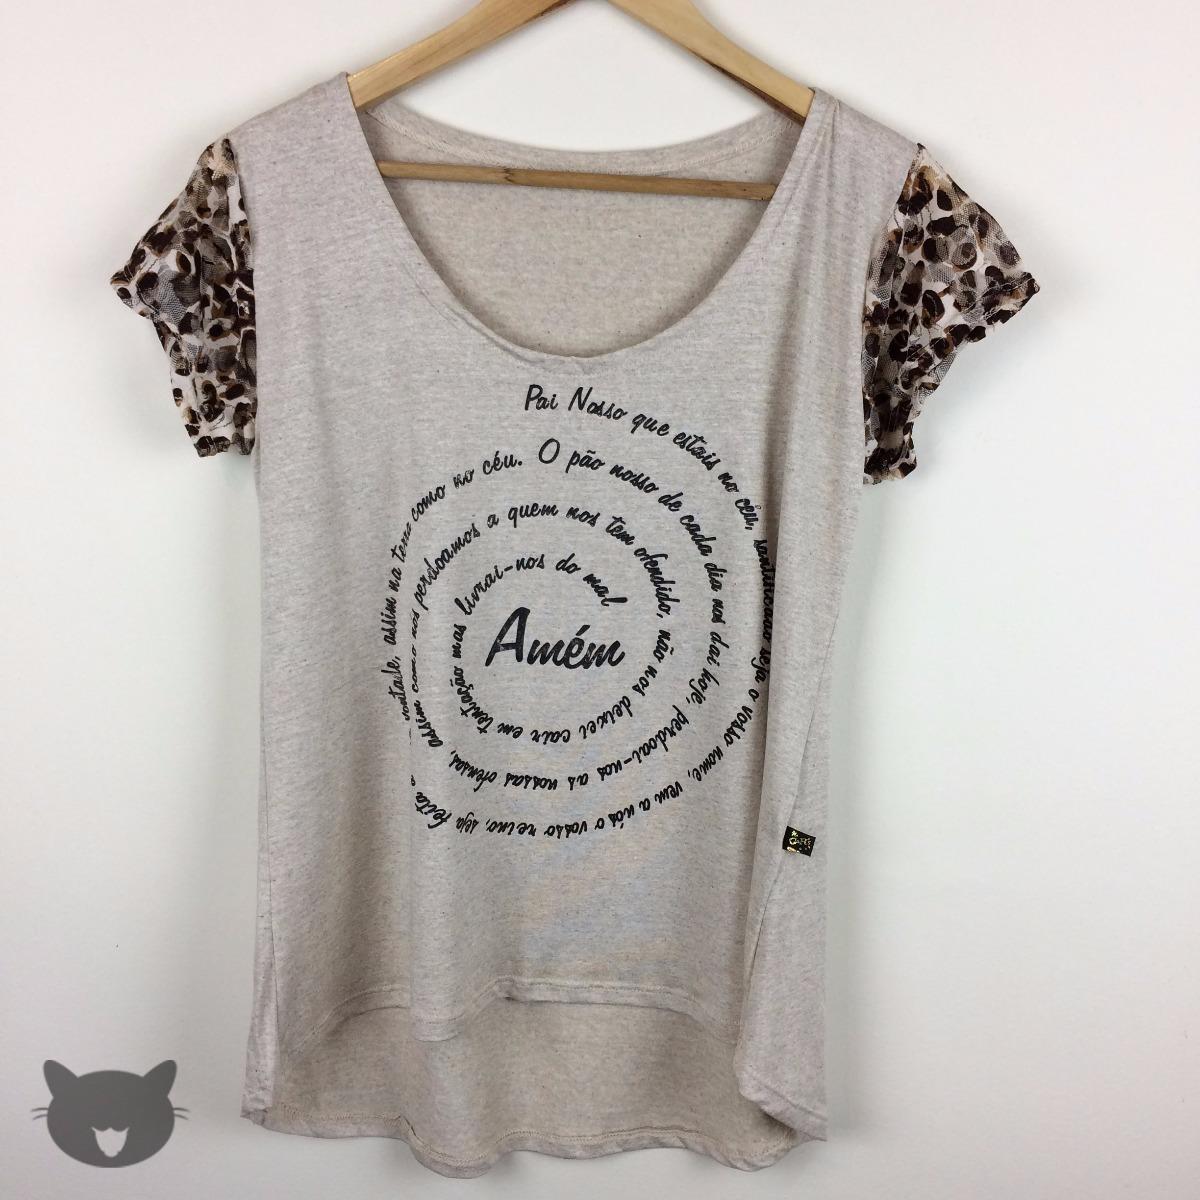 2b3830ee1a t-shirt camiseta blusa feminina mullet fé gospel deus cristo. Carregando  zoom.